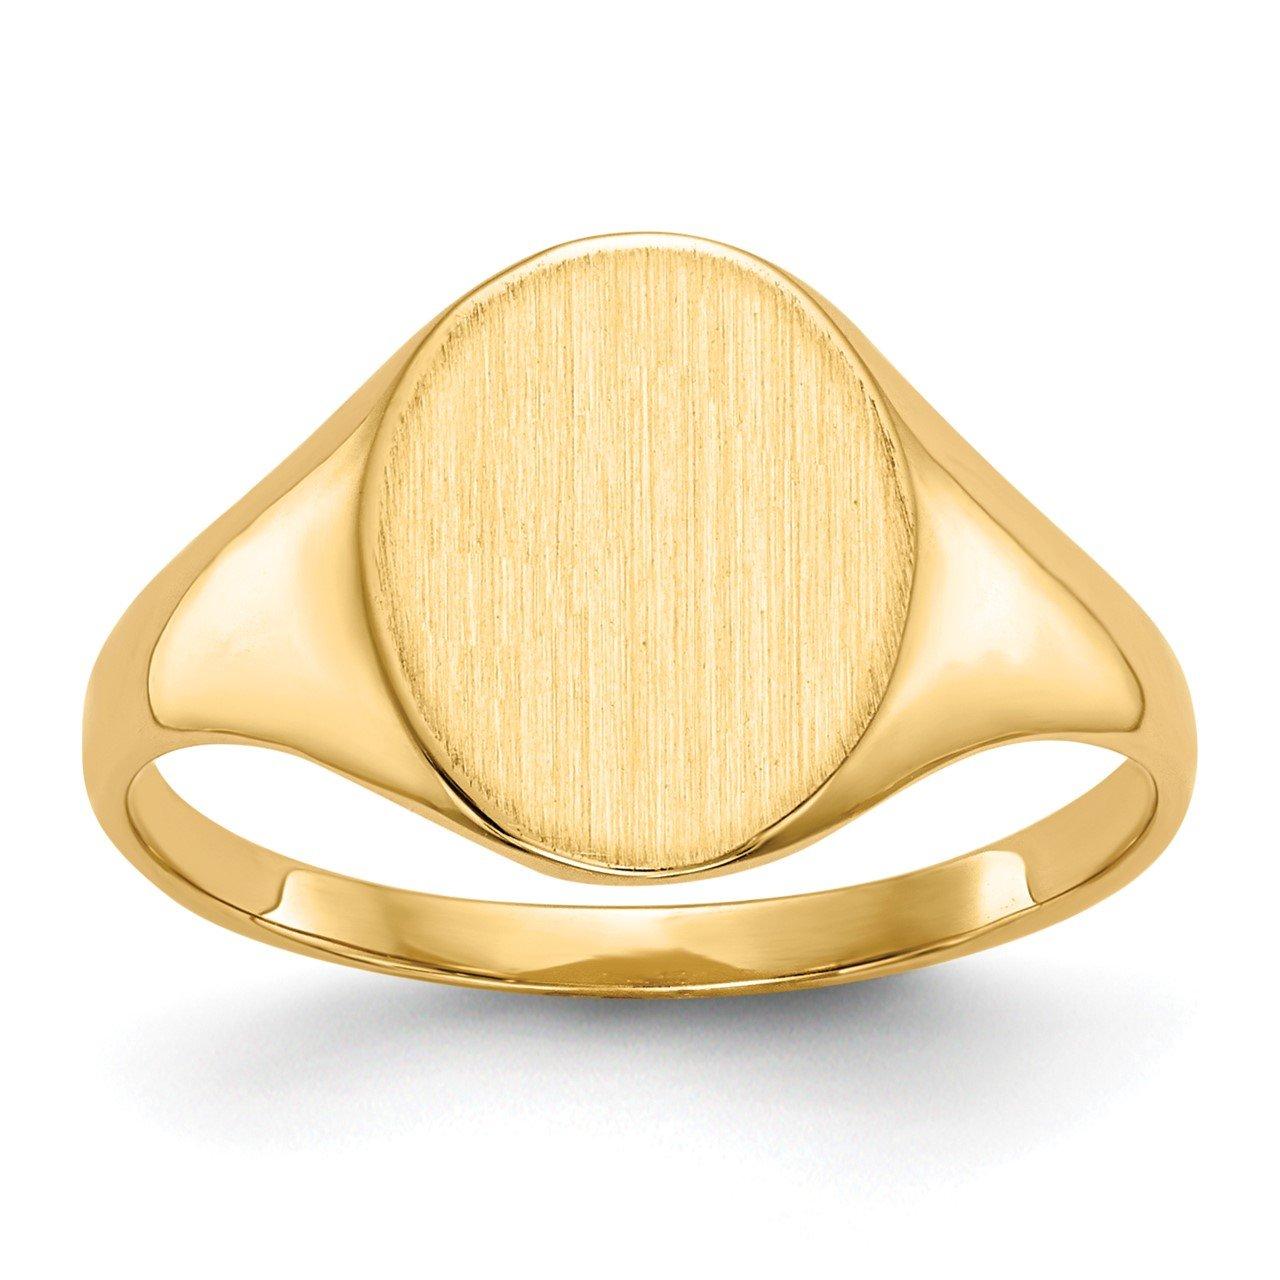 14k 11.0x9.5mm Closed Back Signet Ring